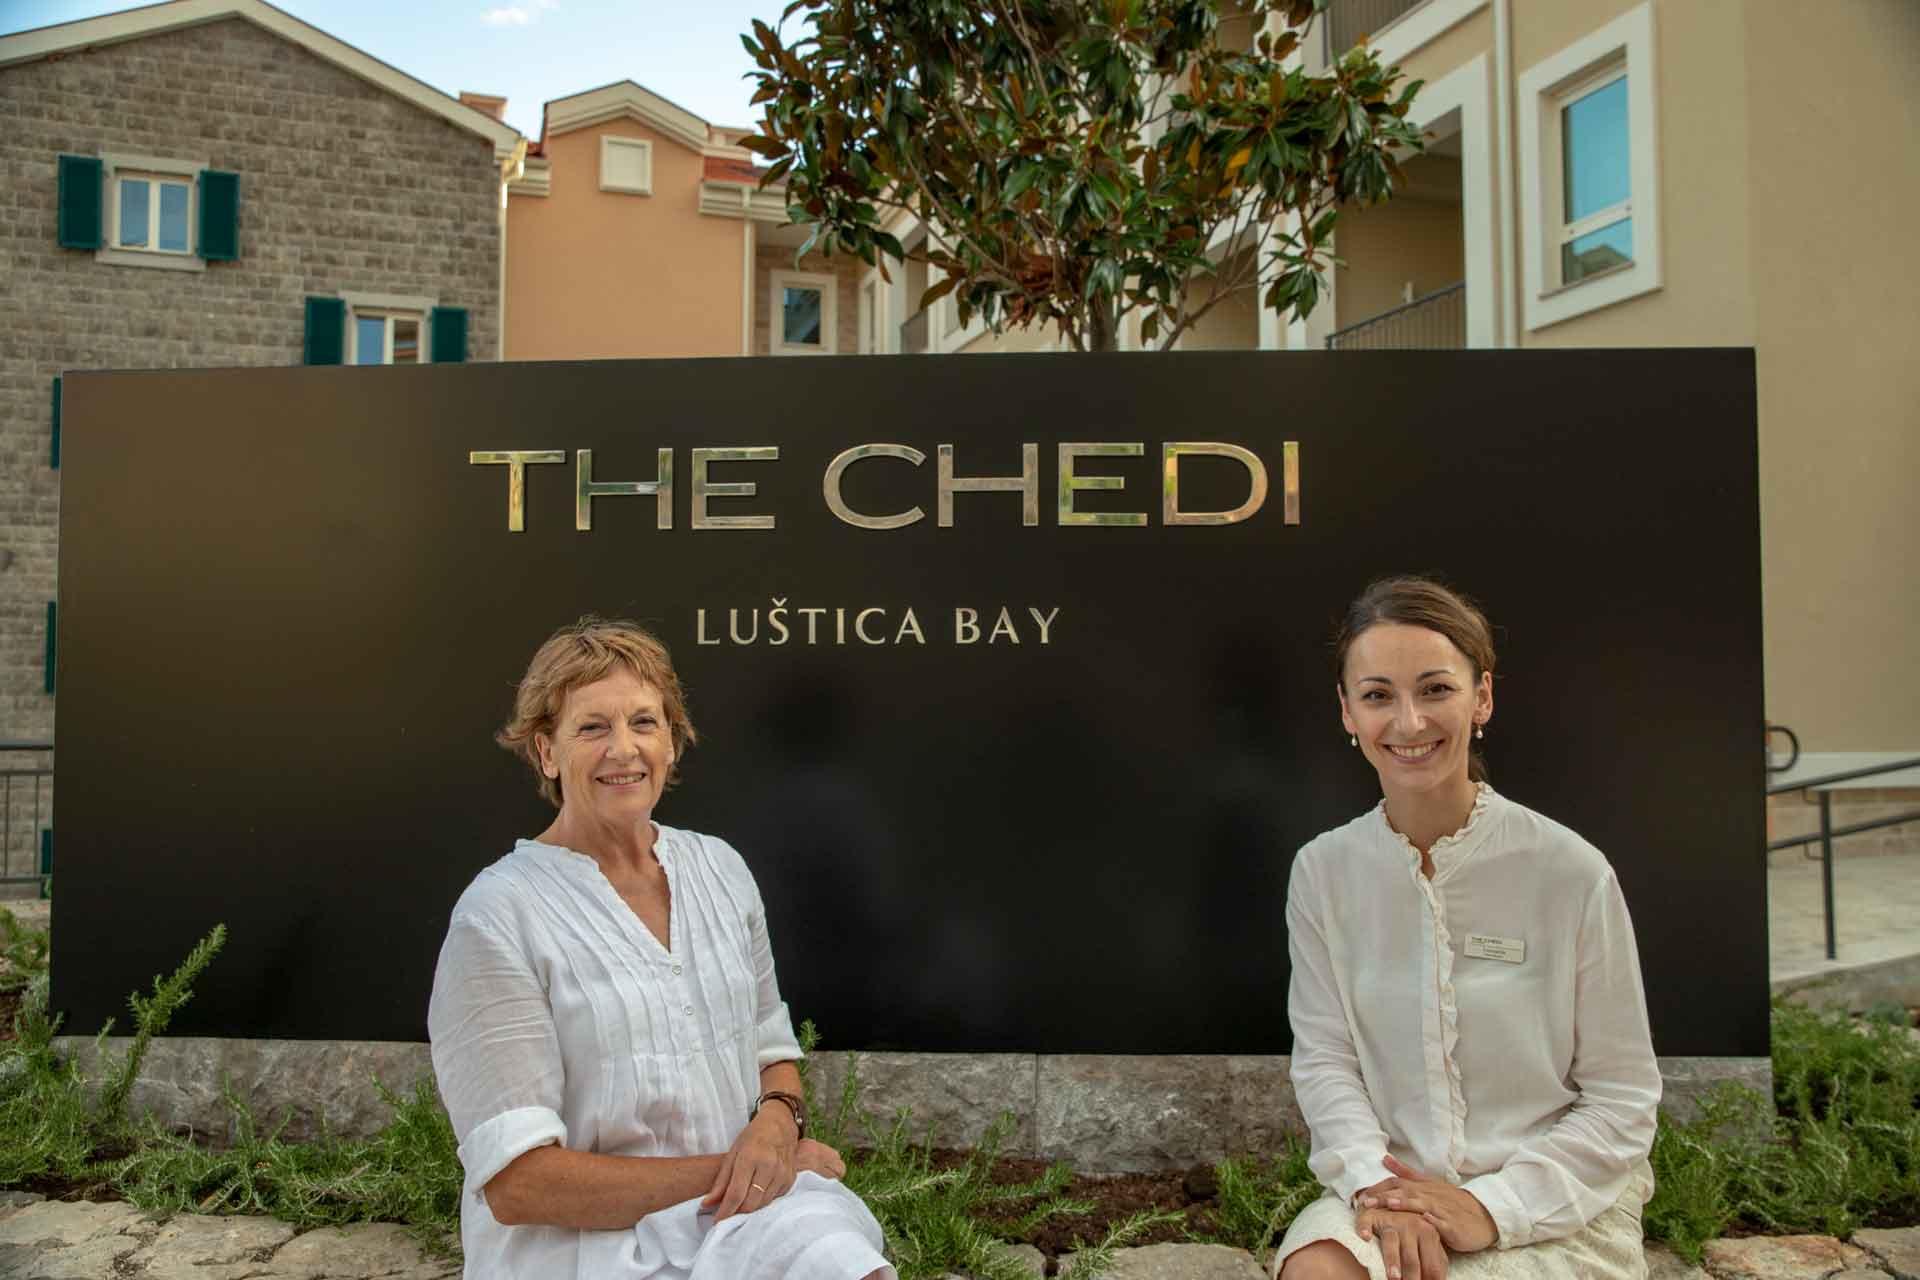 The Chedi Lustica Bay, Mrs. Gabriele Schray. Mrs. Leonarda Dedic